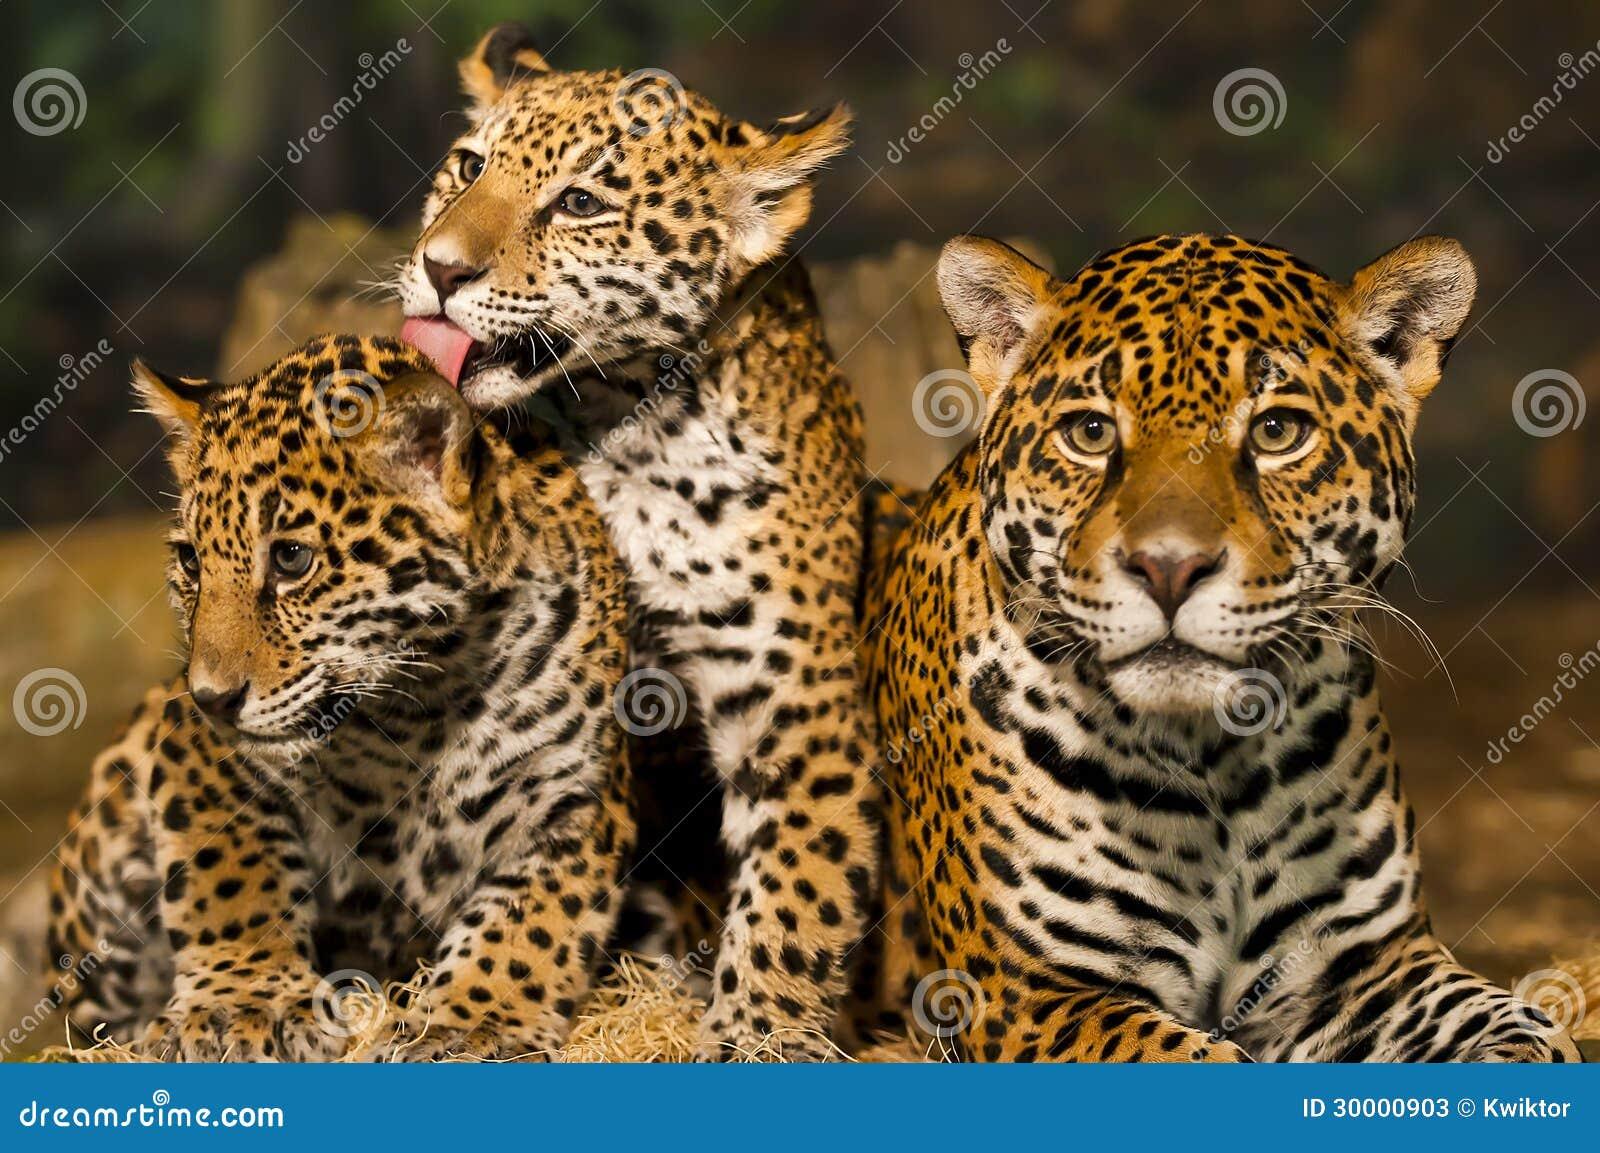 Jaguar Family Stock Photos - Image: 30000903 Leopard Cubs With Mother